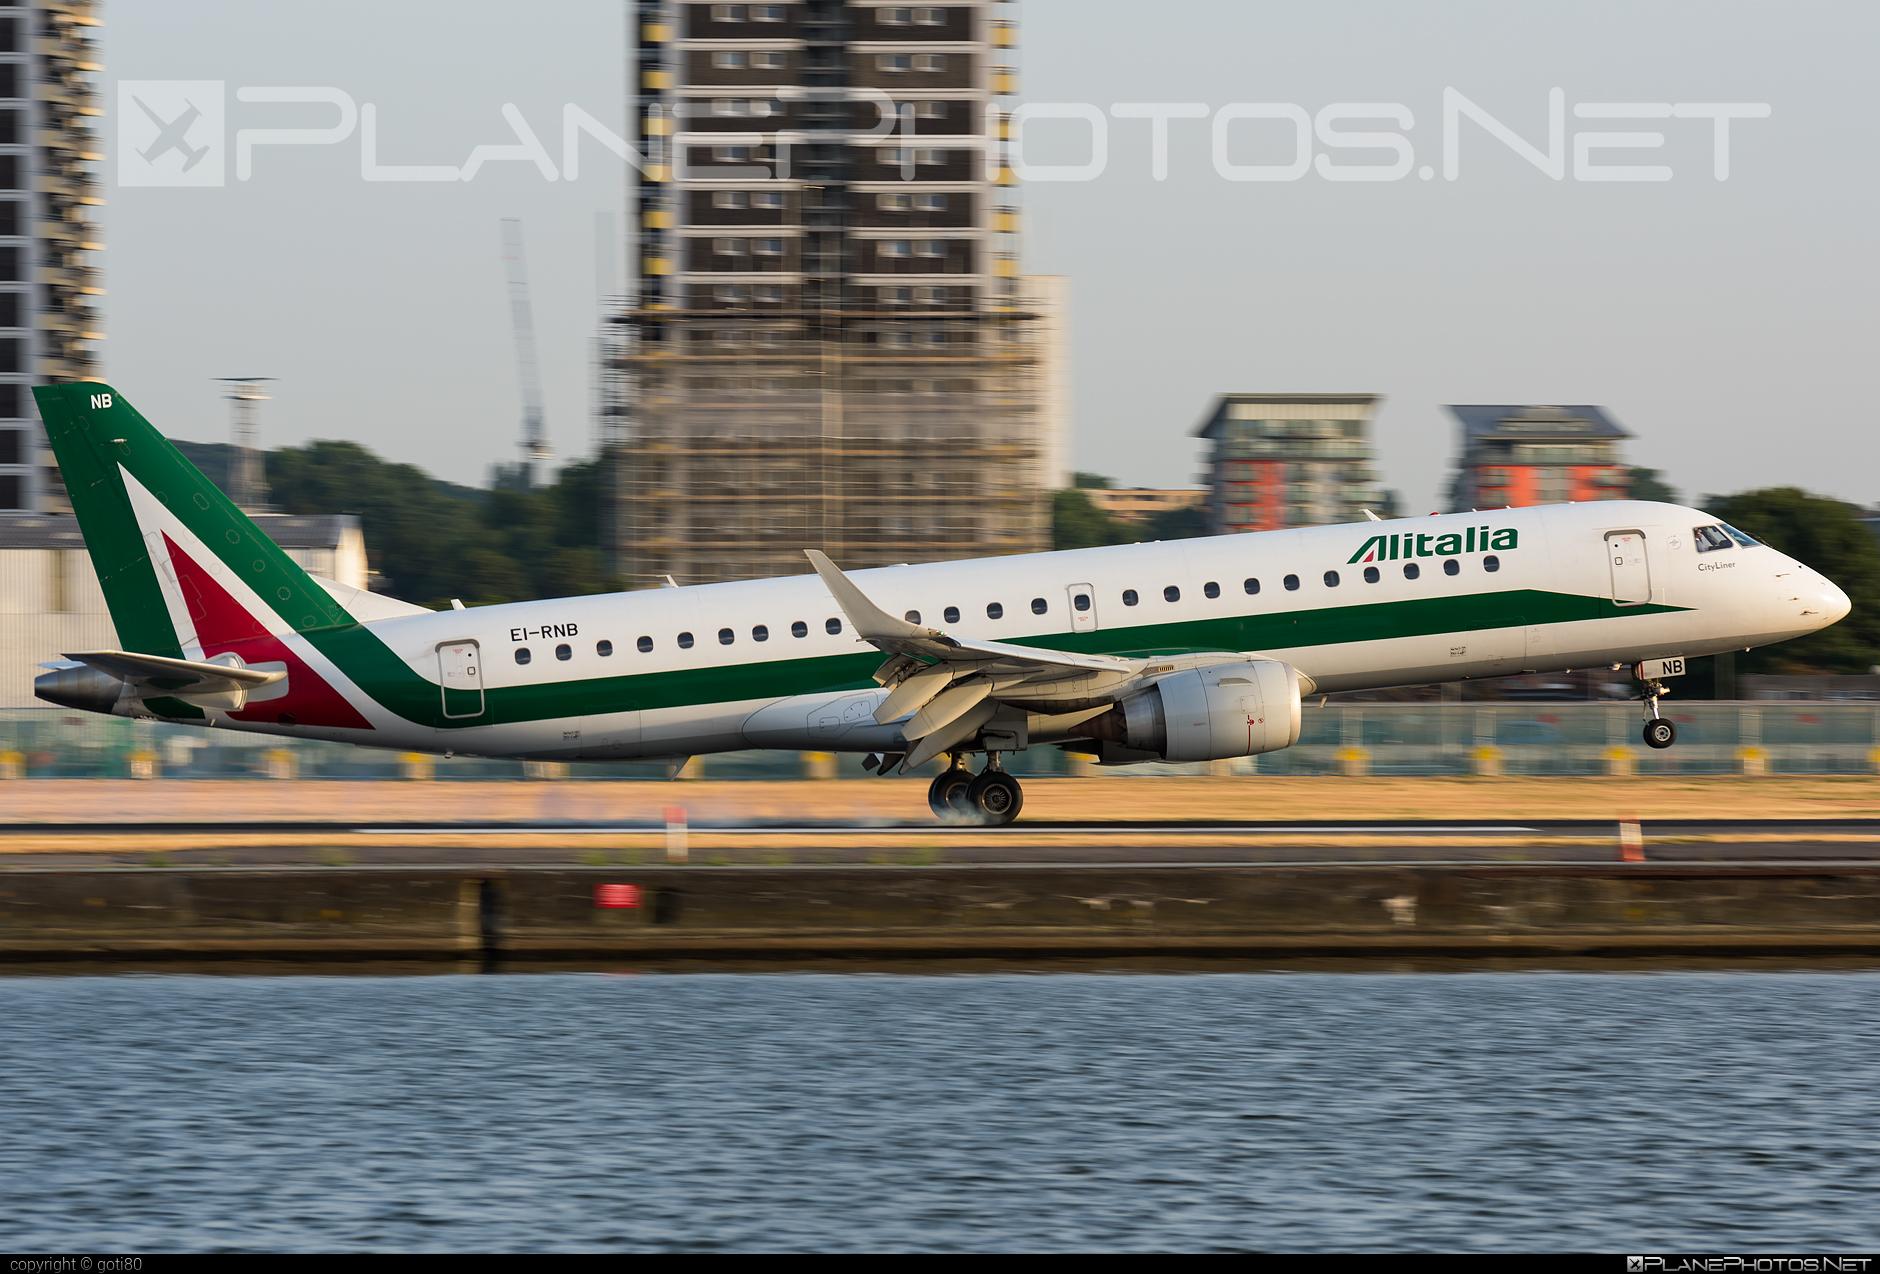 Embraer E190STD (ERJ-190-100STD) - EI-RNB operated by Alitalia CityLiner #e190 #e190100 #e190100std #e190std #embraer #embraer190 #embraer190100std #embraer190std